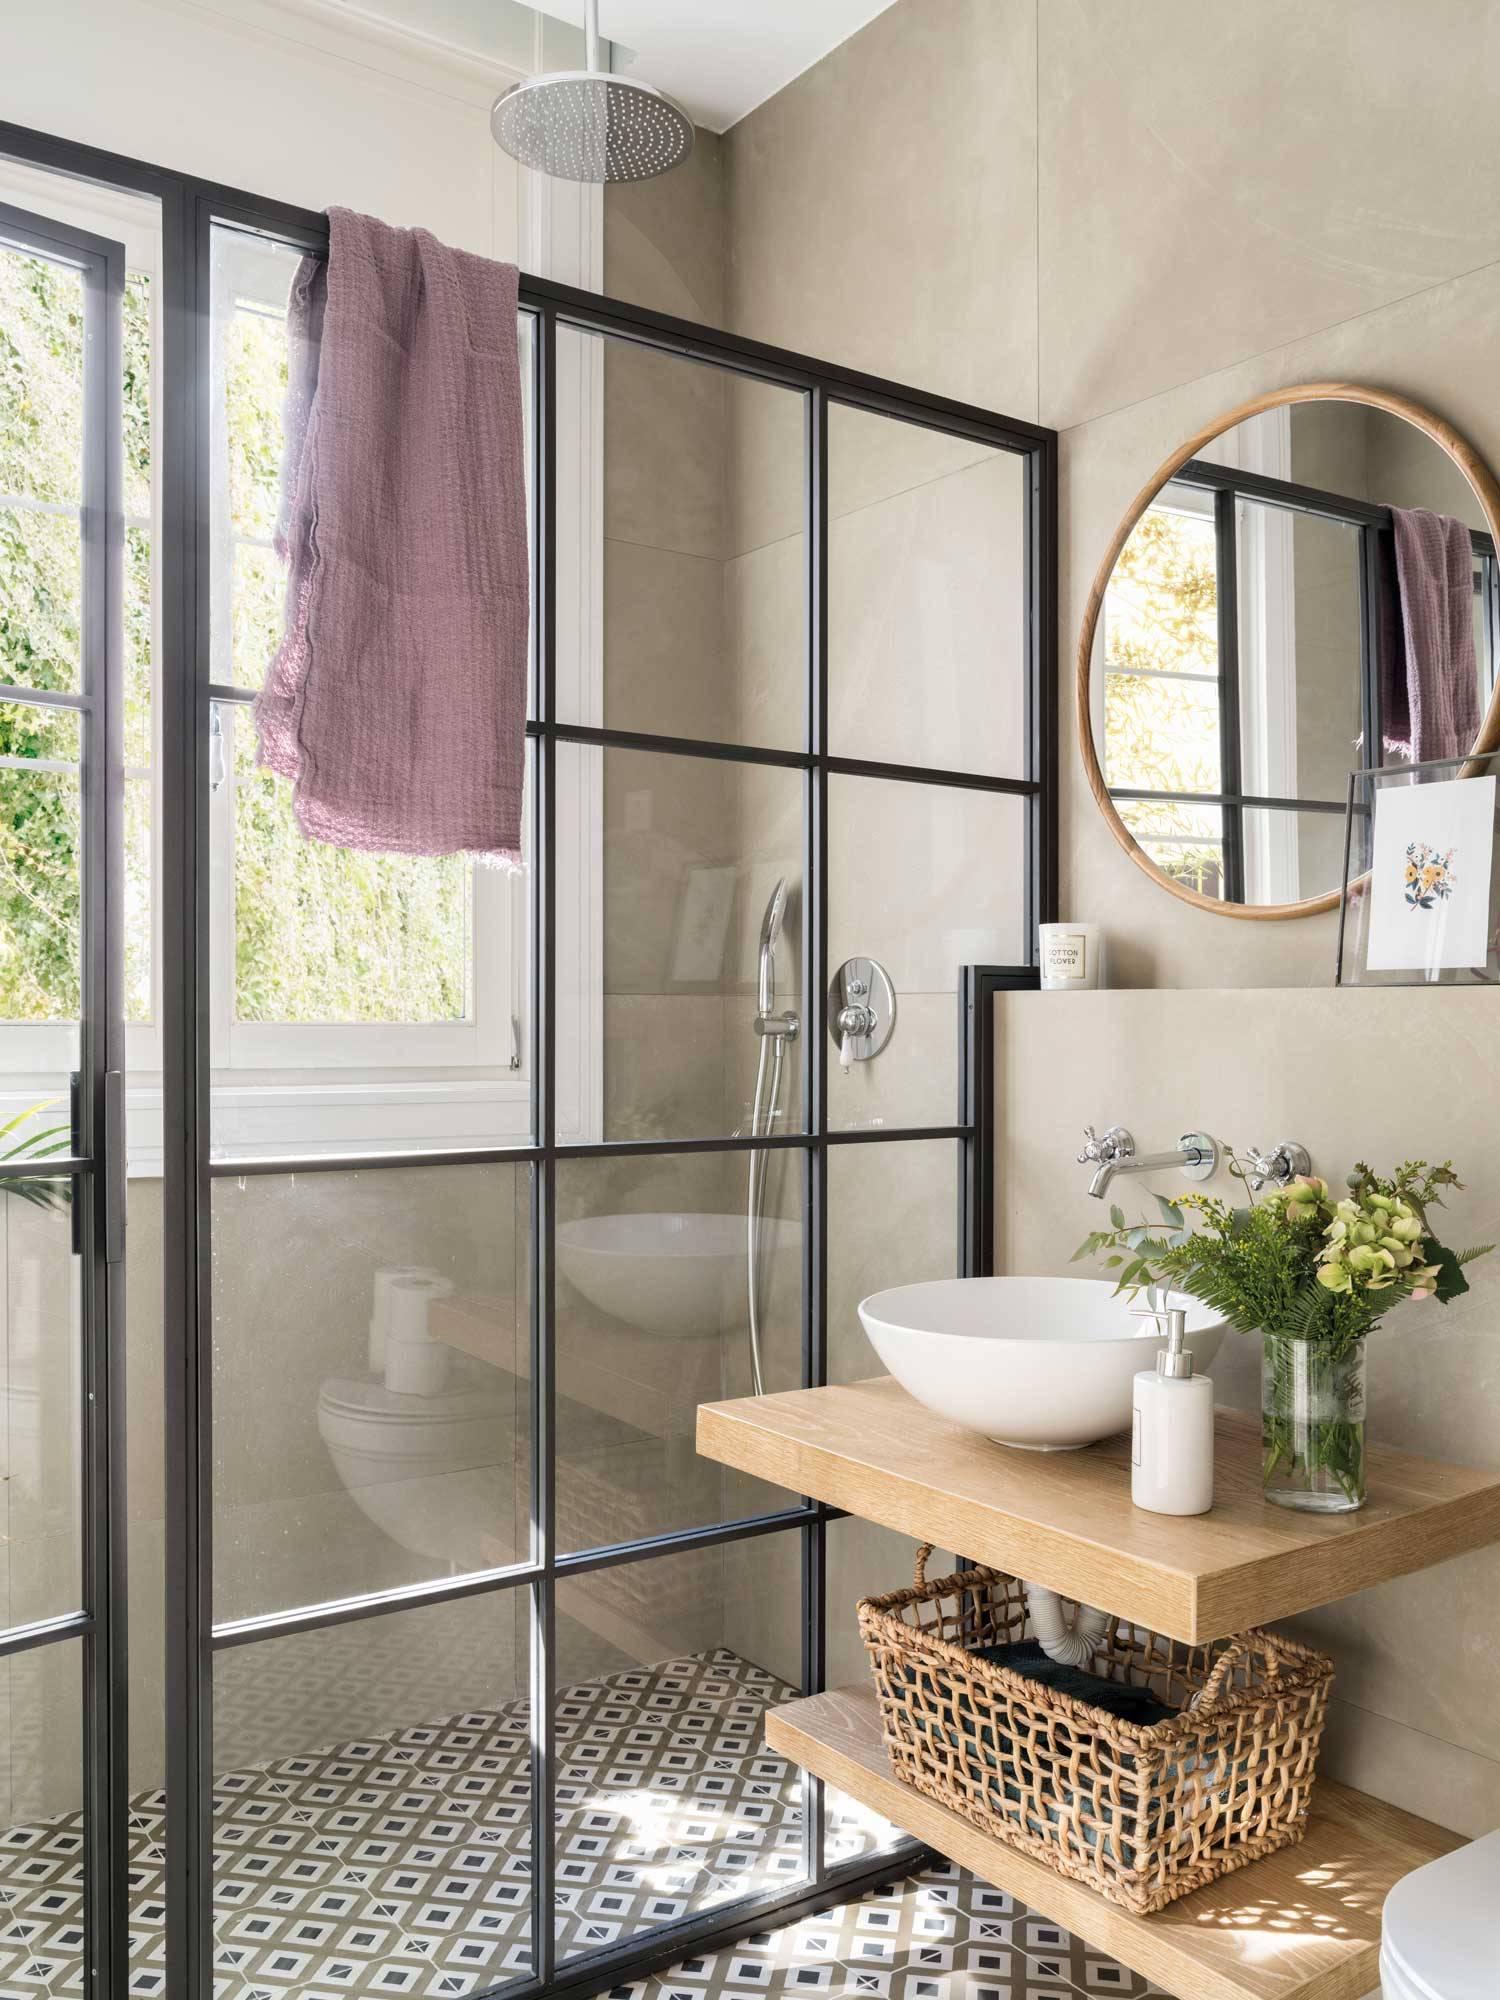 dilema-deco-cortina-o-mampara-00495538. ¿Cómo se limpian mampara y cortina?